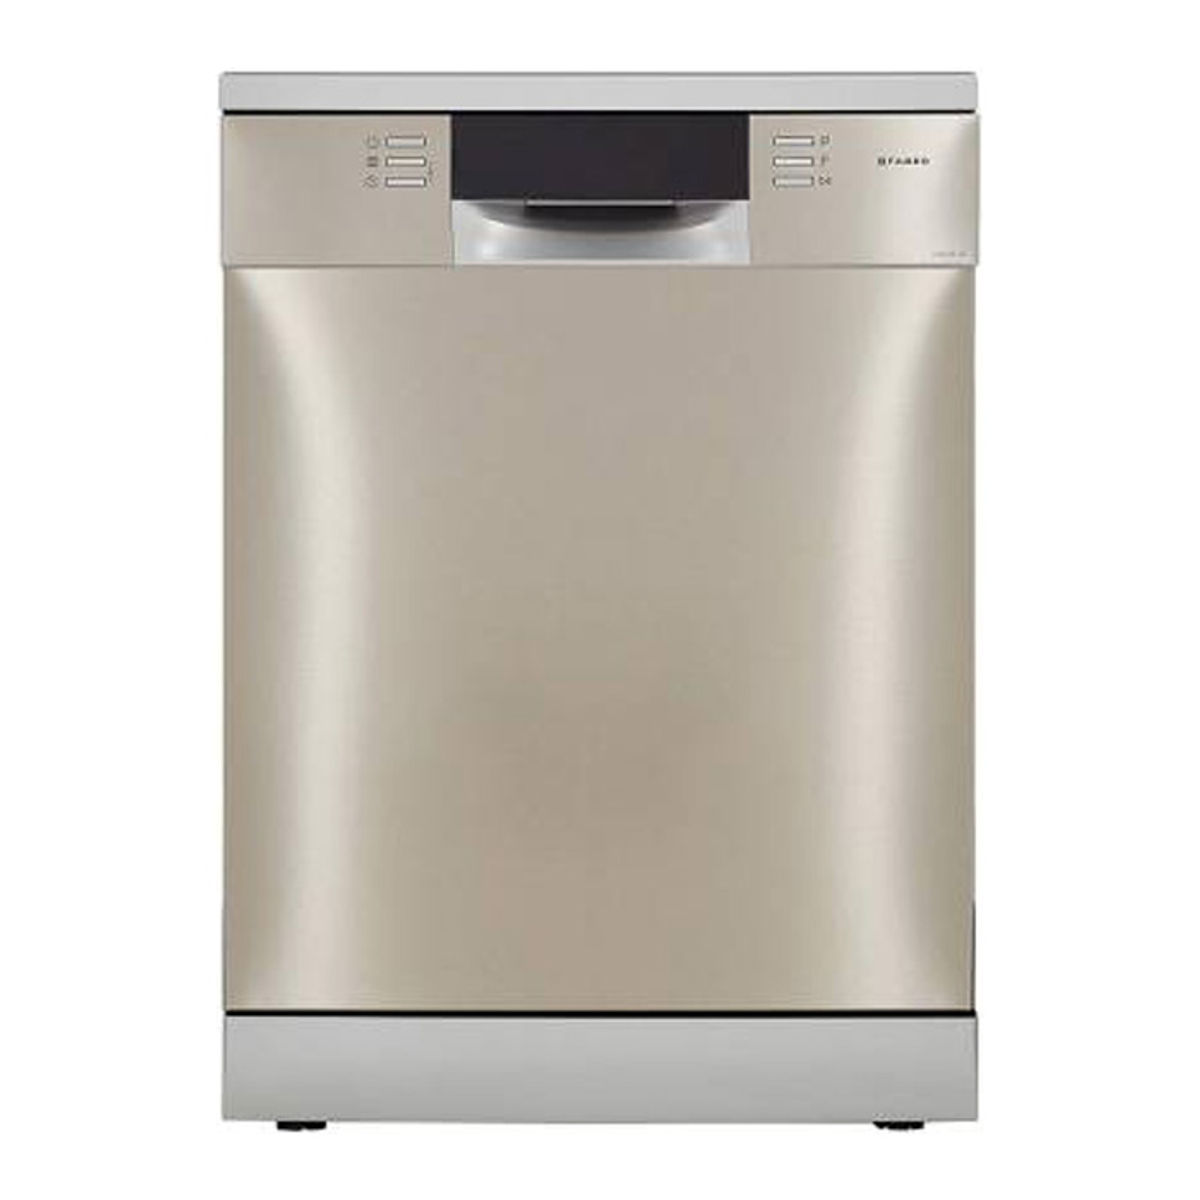 Faber FFSD 6PR Dishwasher